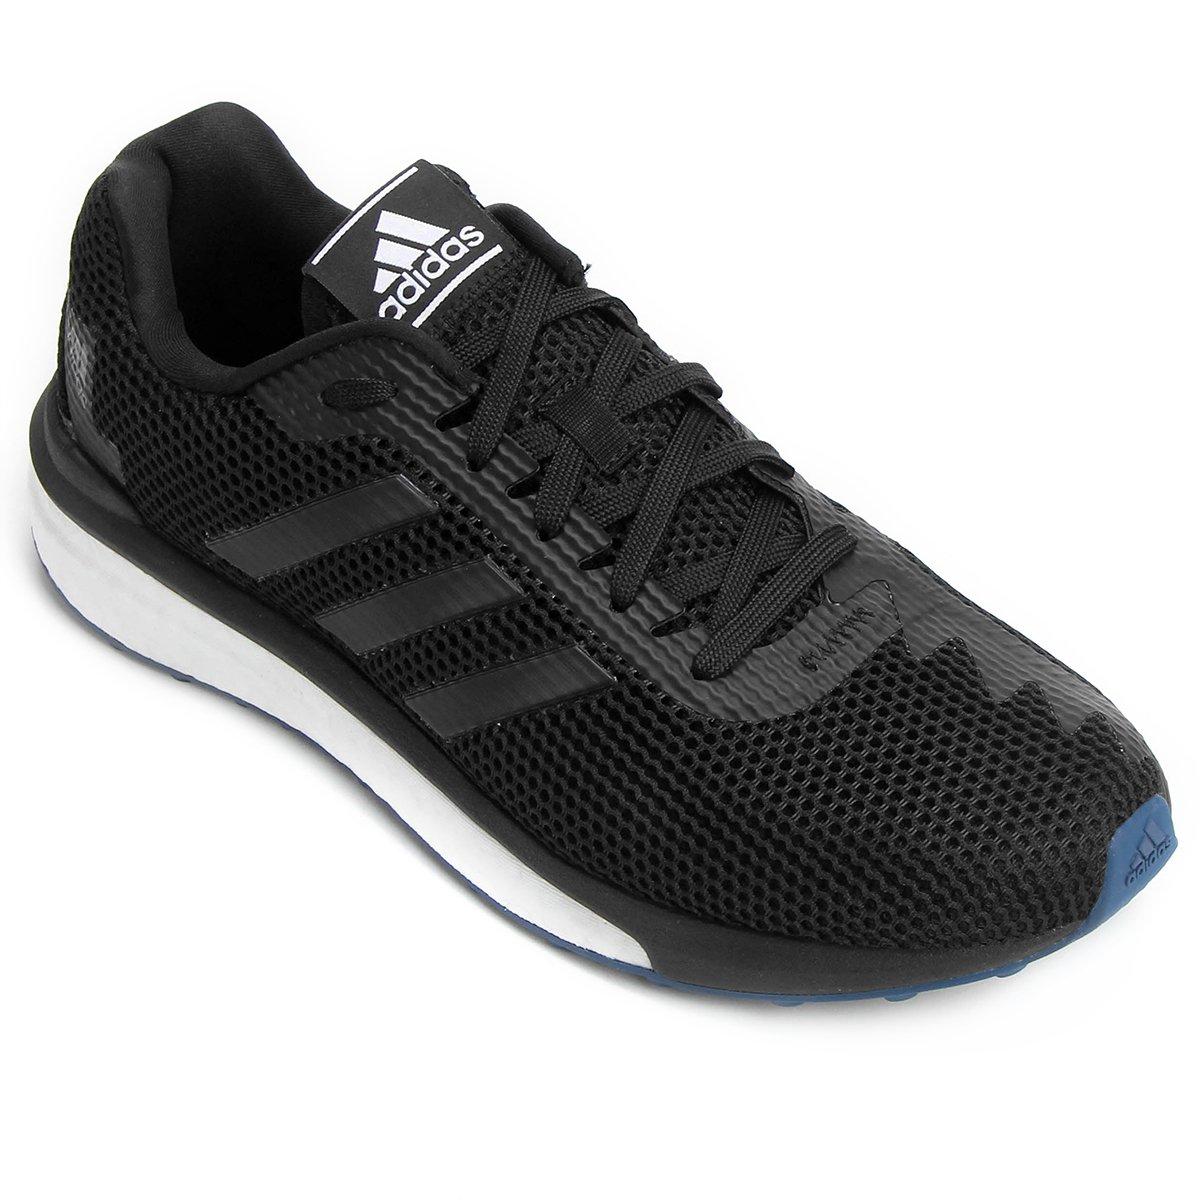 Tênis Adidas Adidas Adidas Vengeful Masculino Compre Agora Netsapatos ccea27